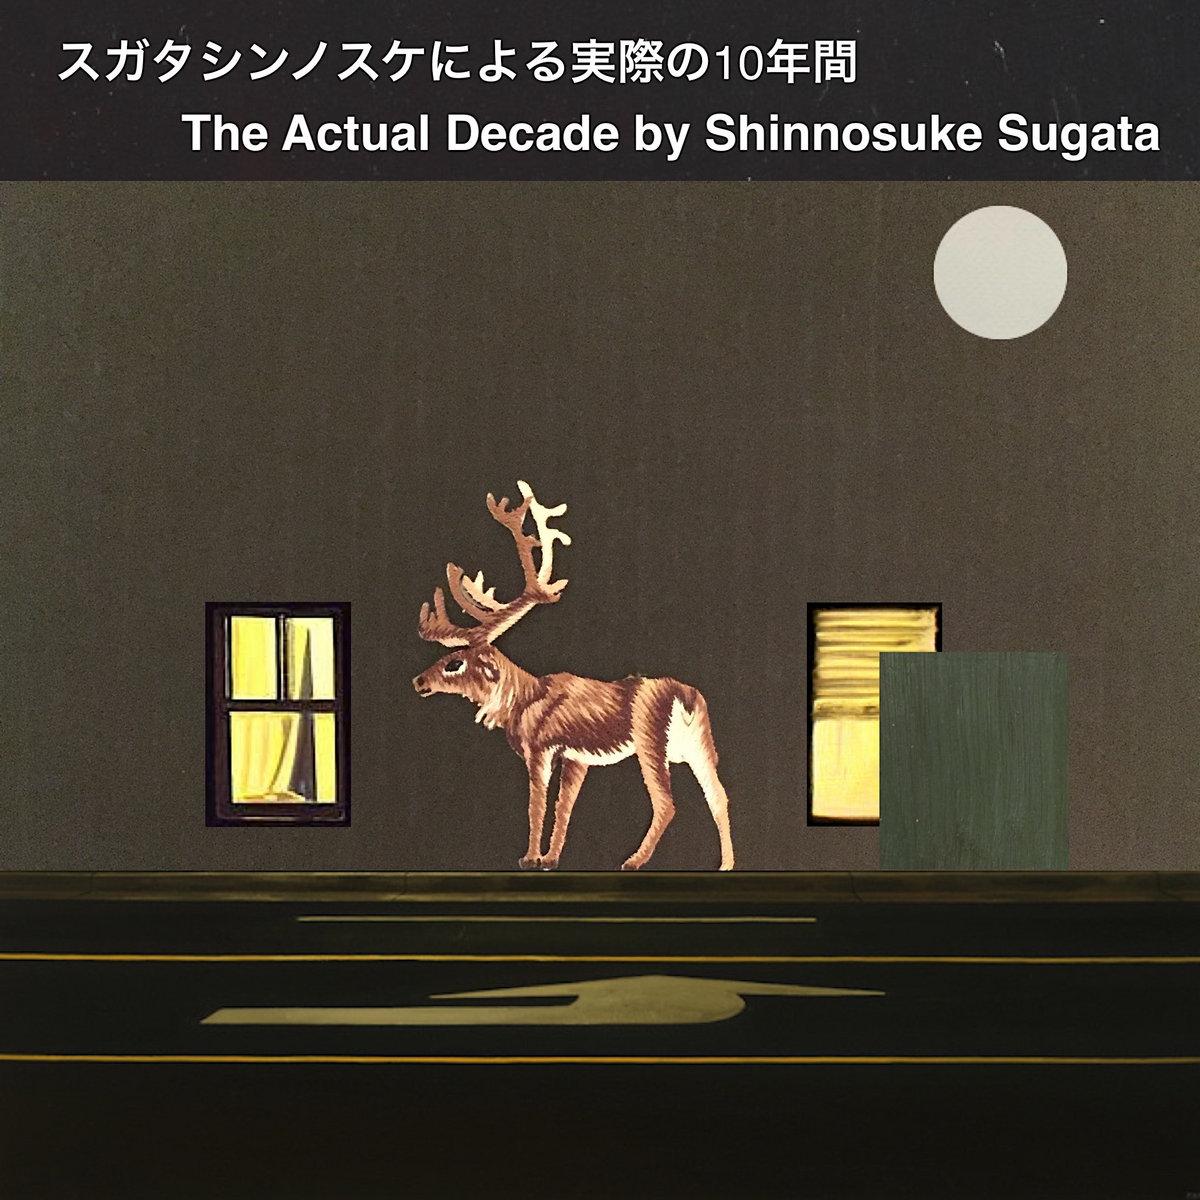 Shinnosuke Sugata – The Actual Decade By Shinnosuke Sugata スガタシンノスケによる実際の10年間 (2011~2020)